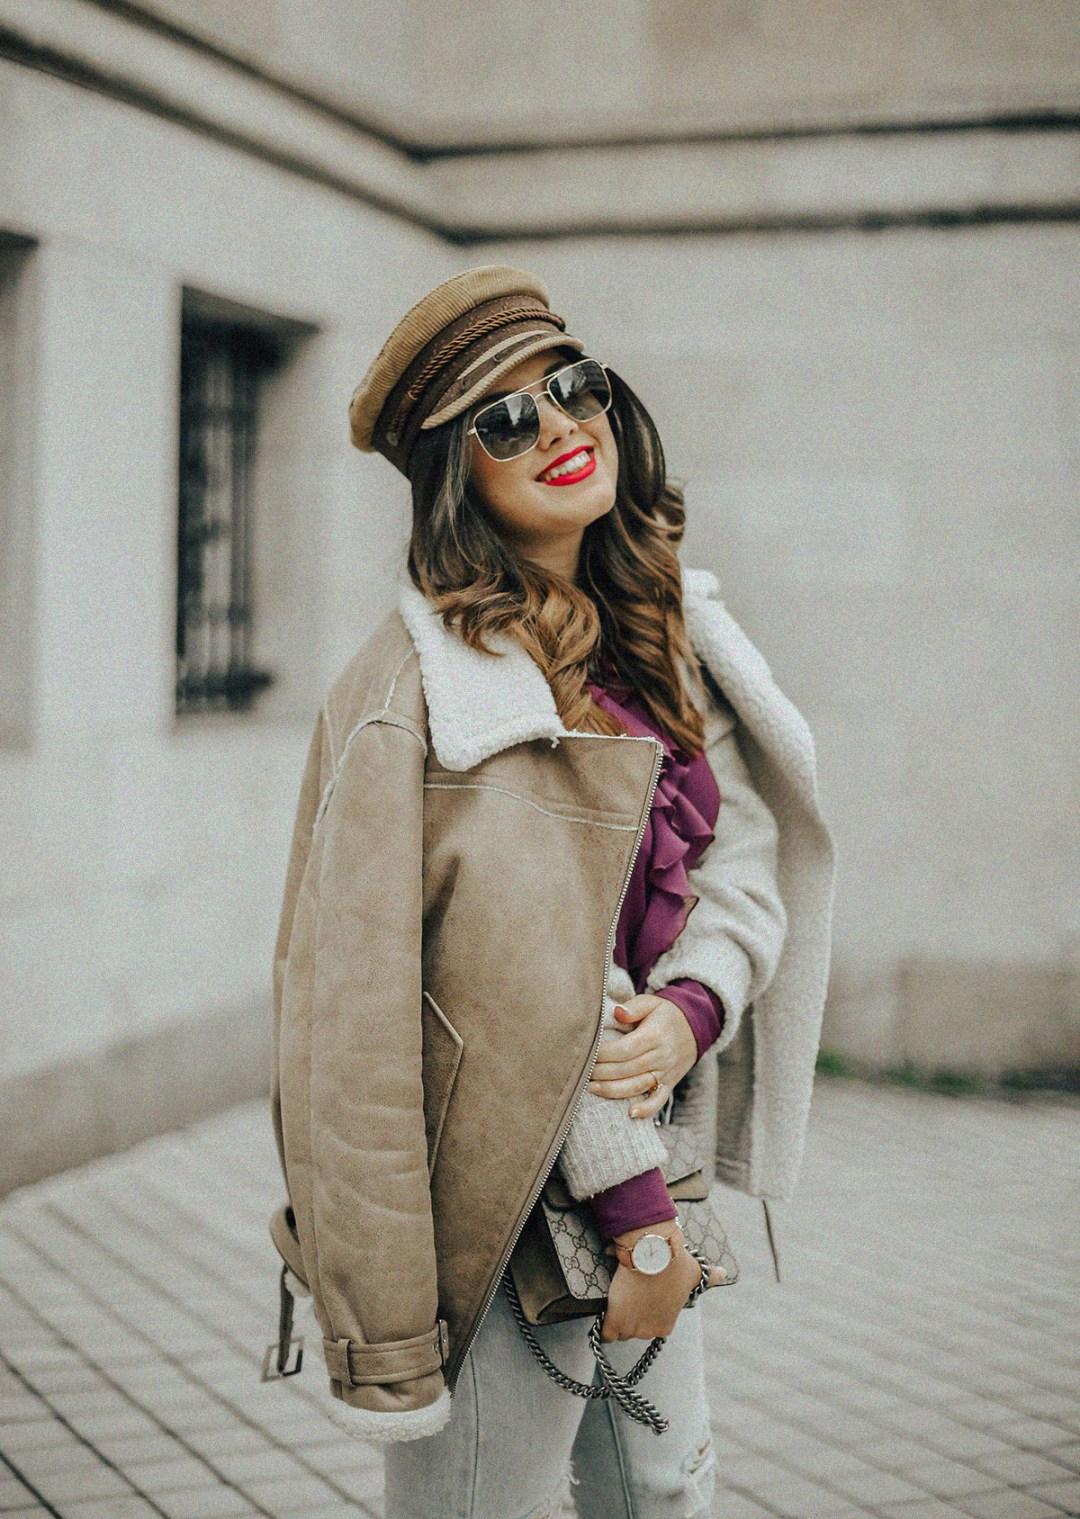 chaqueta-borreguillo-blusa-volantes-pipa-de-la-paz-myblueberrynightsblog13